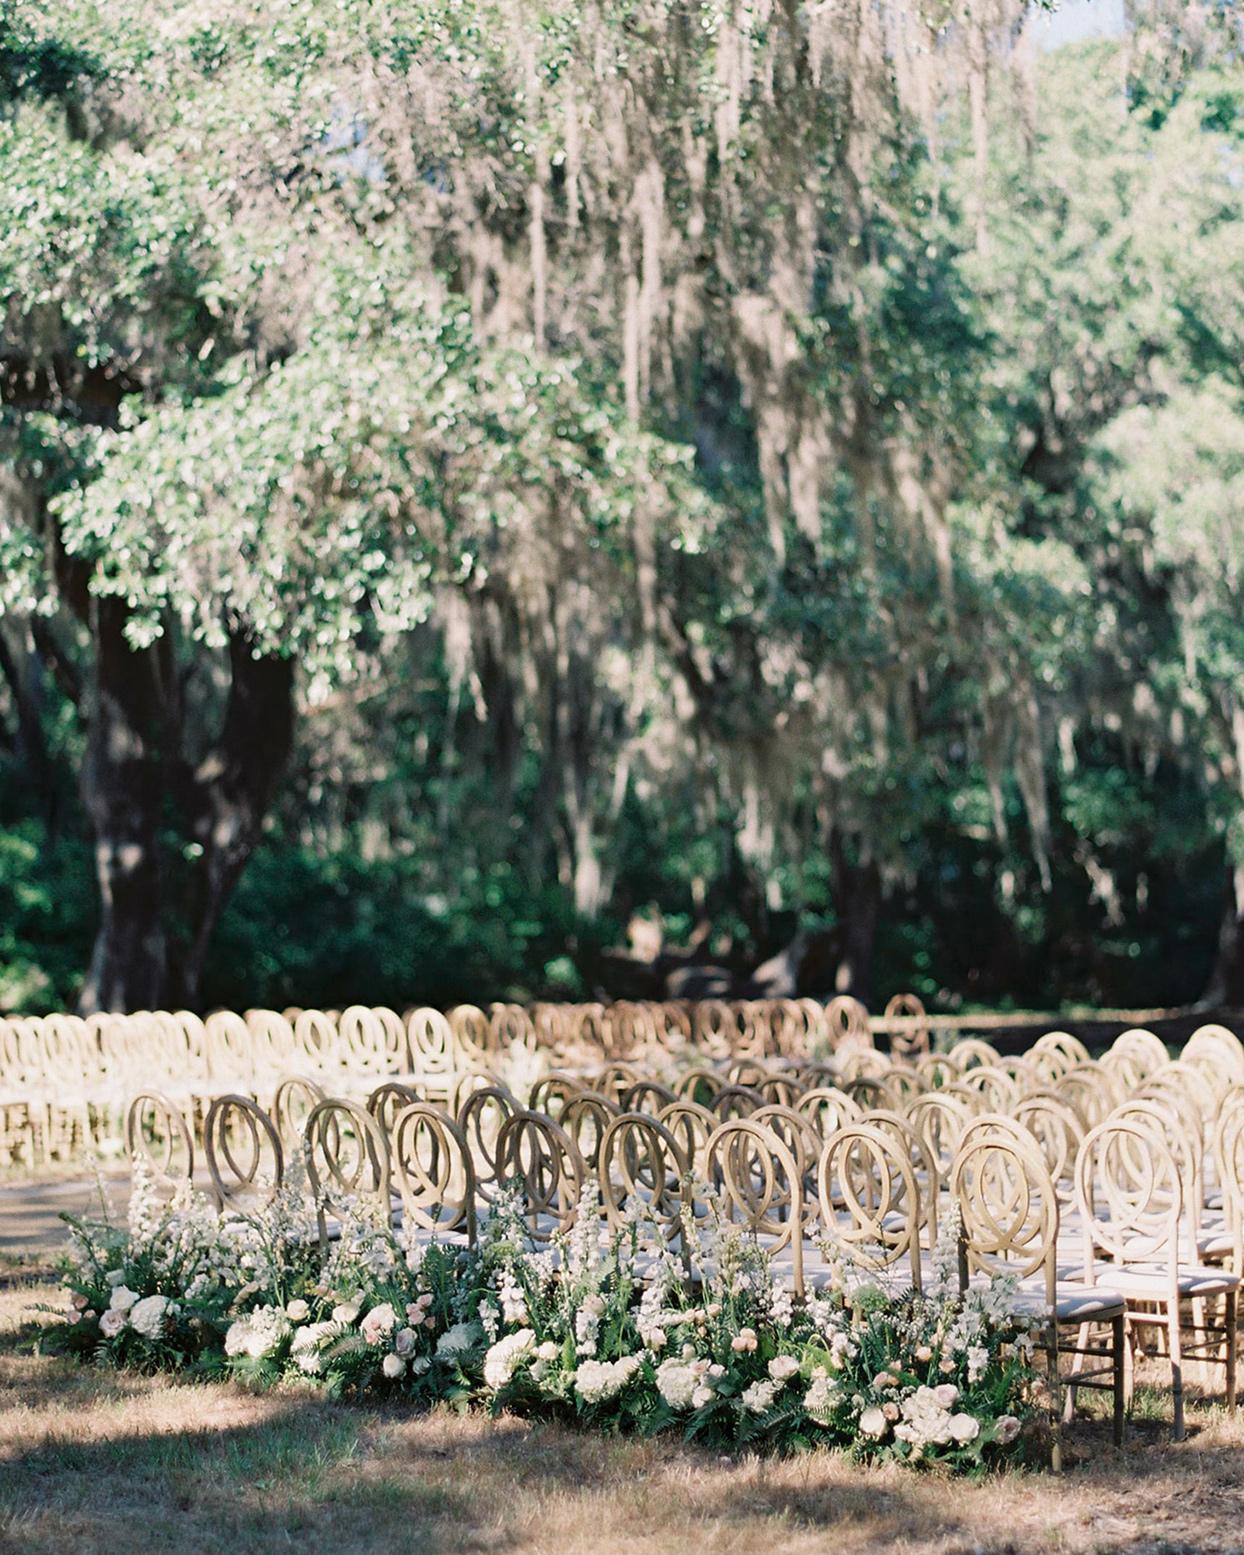 chelsea john wedding wooden ceremony chairs